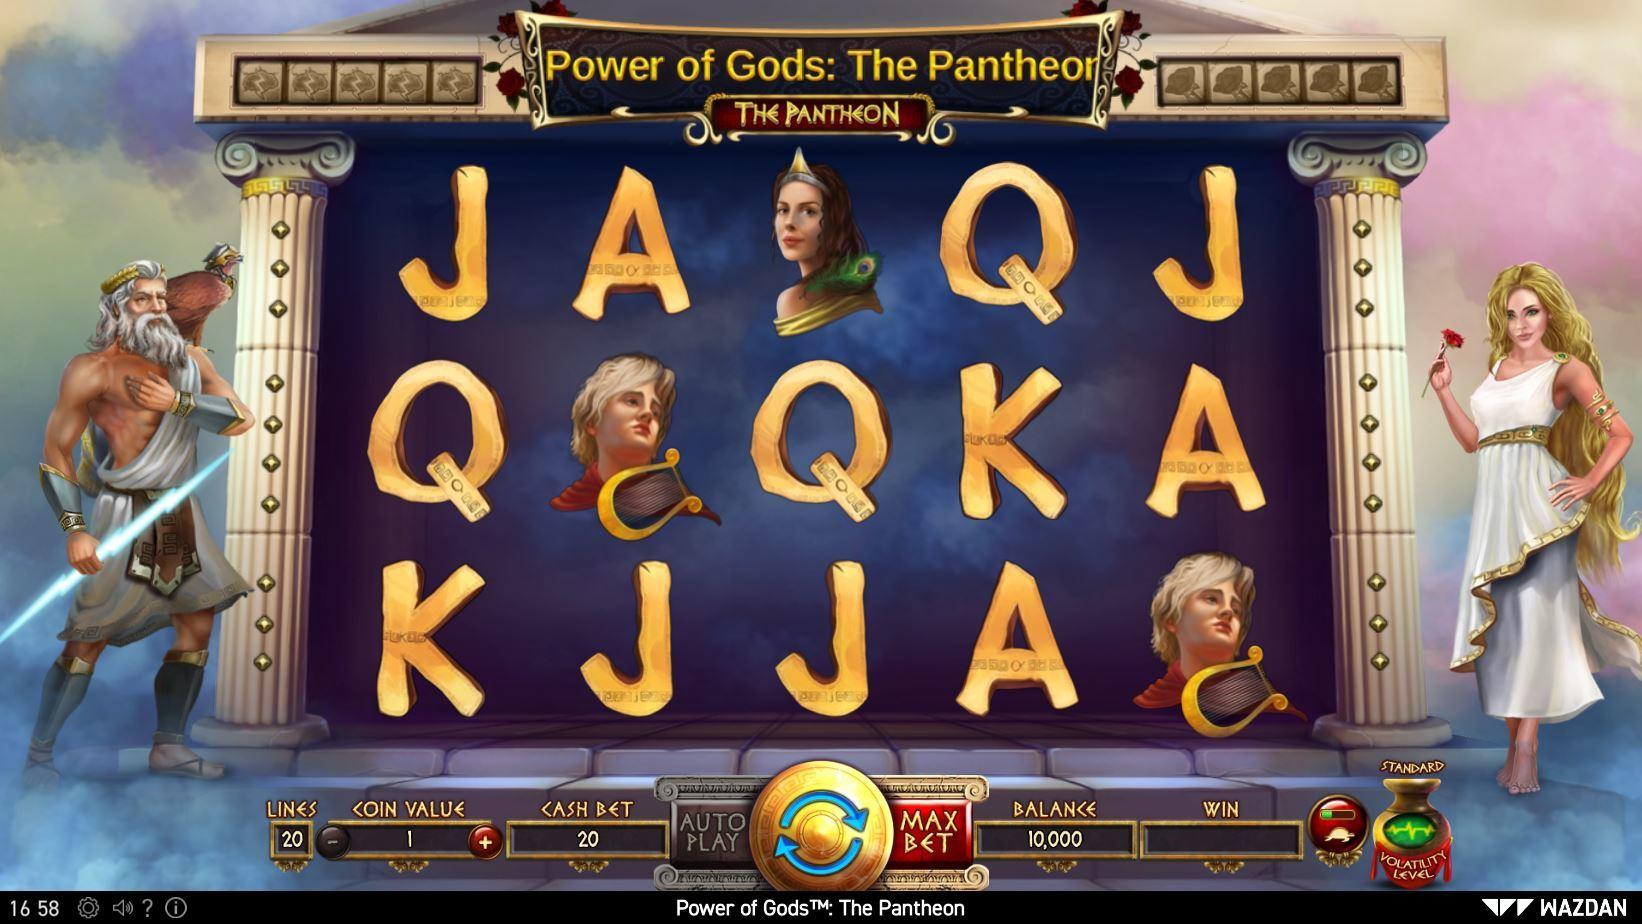 Power of Gods The Pantheon Online Sot by Wazdan - Scatters Online Casino